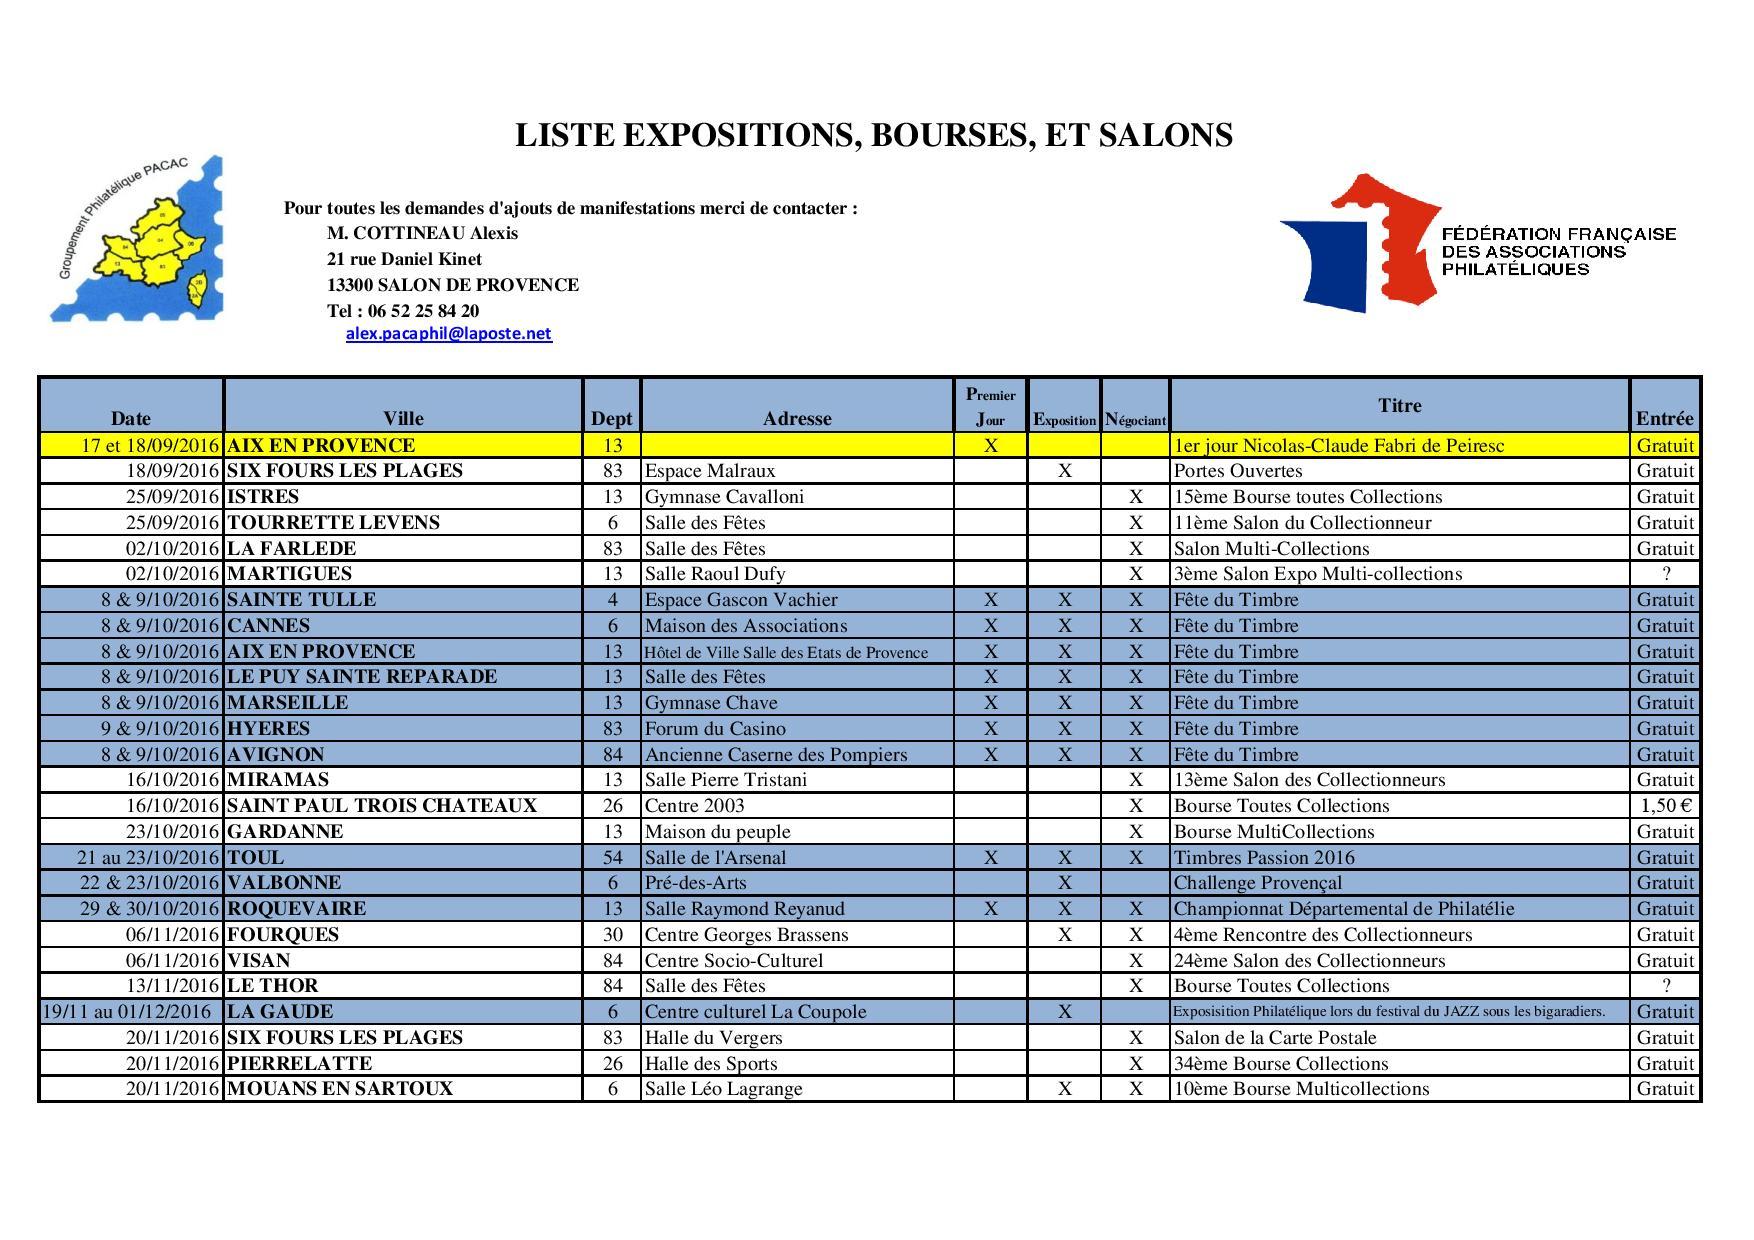 gpp-liste-exposition-25-08-2016-page-001-copie